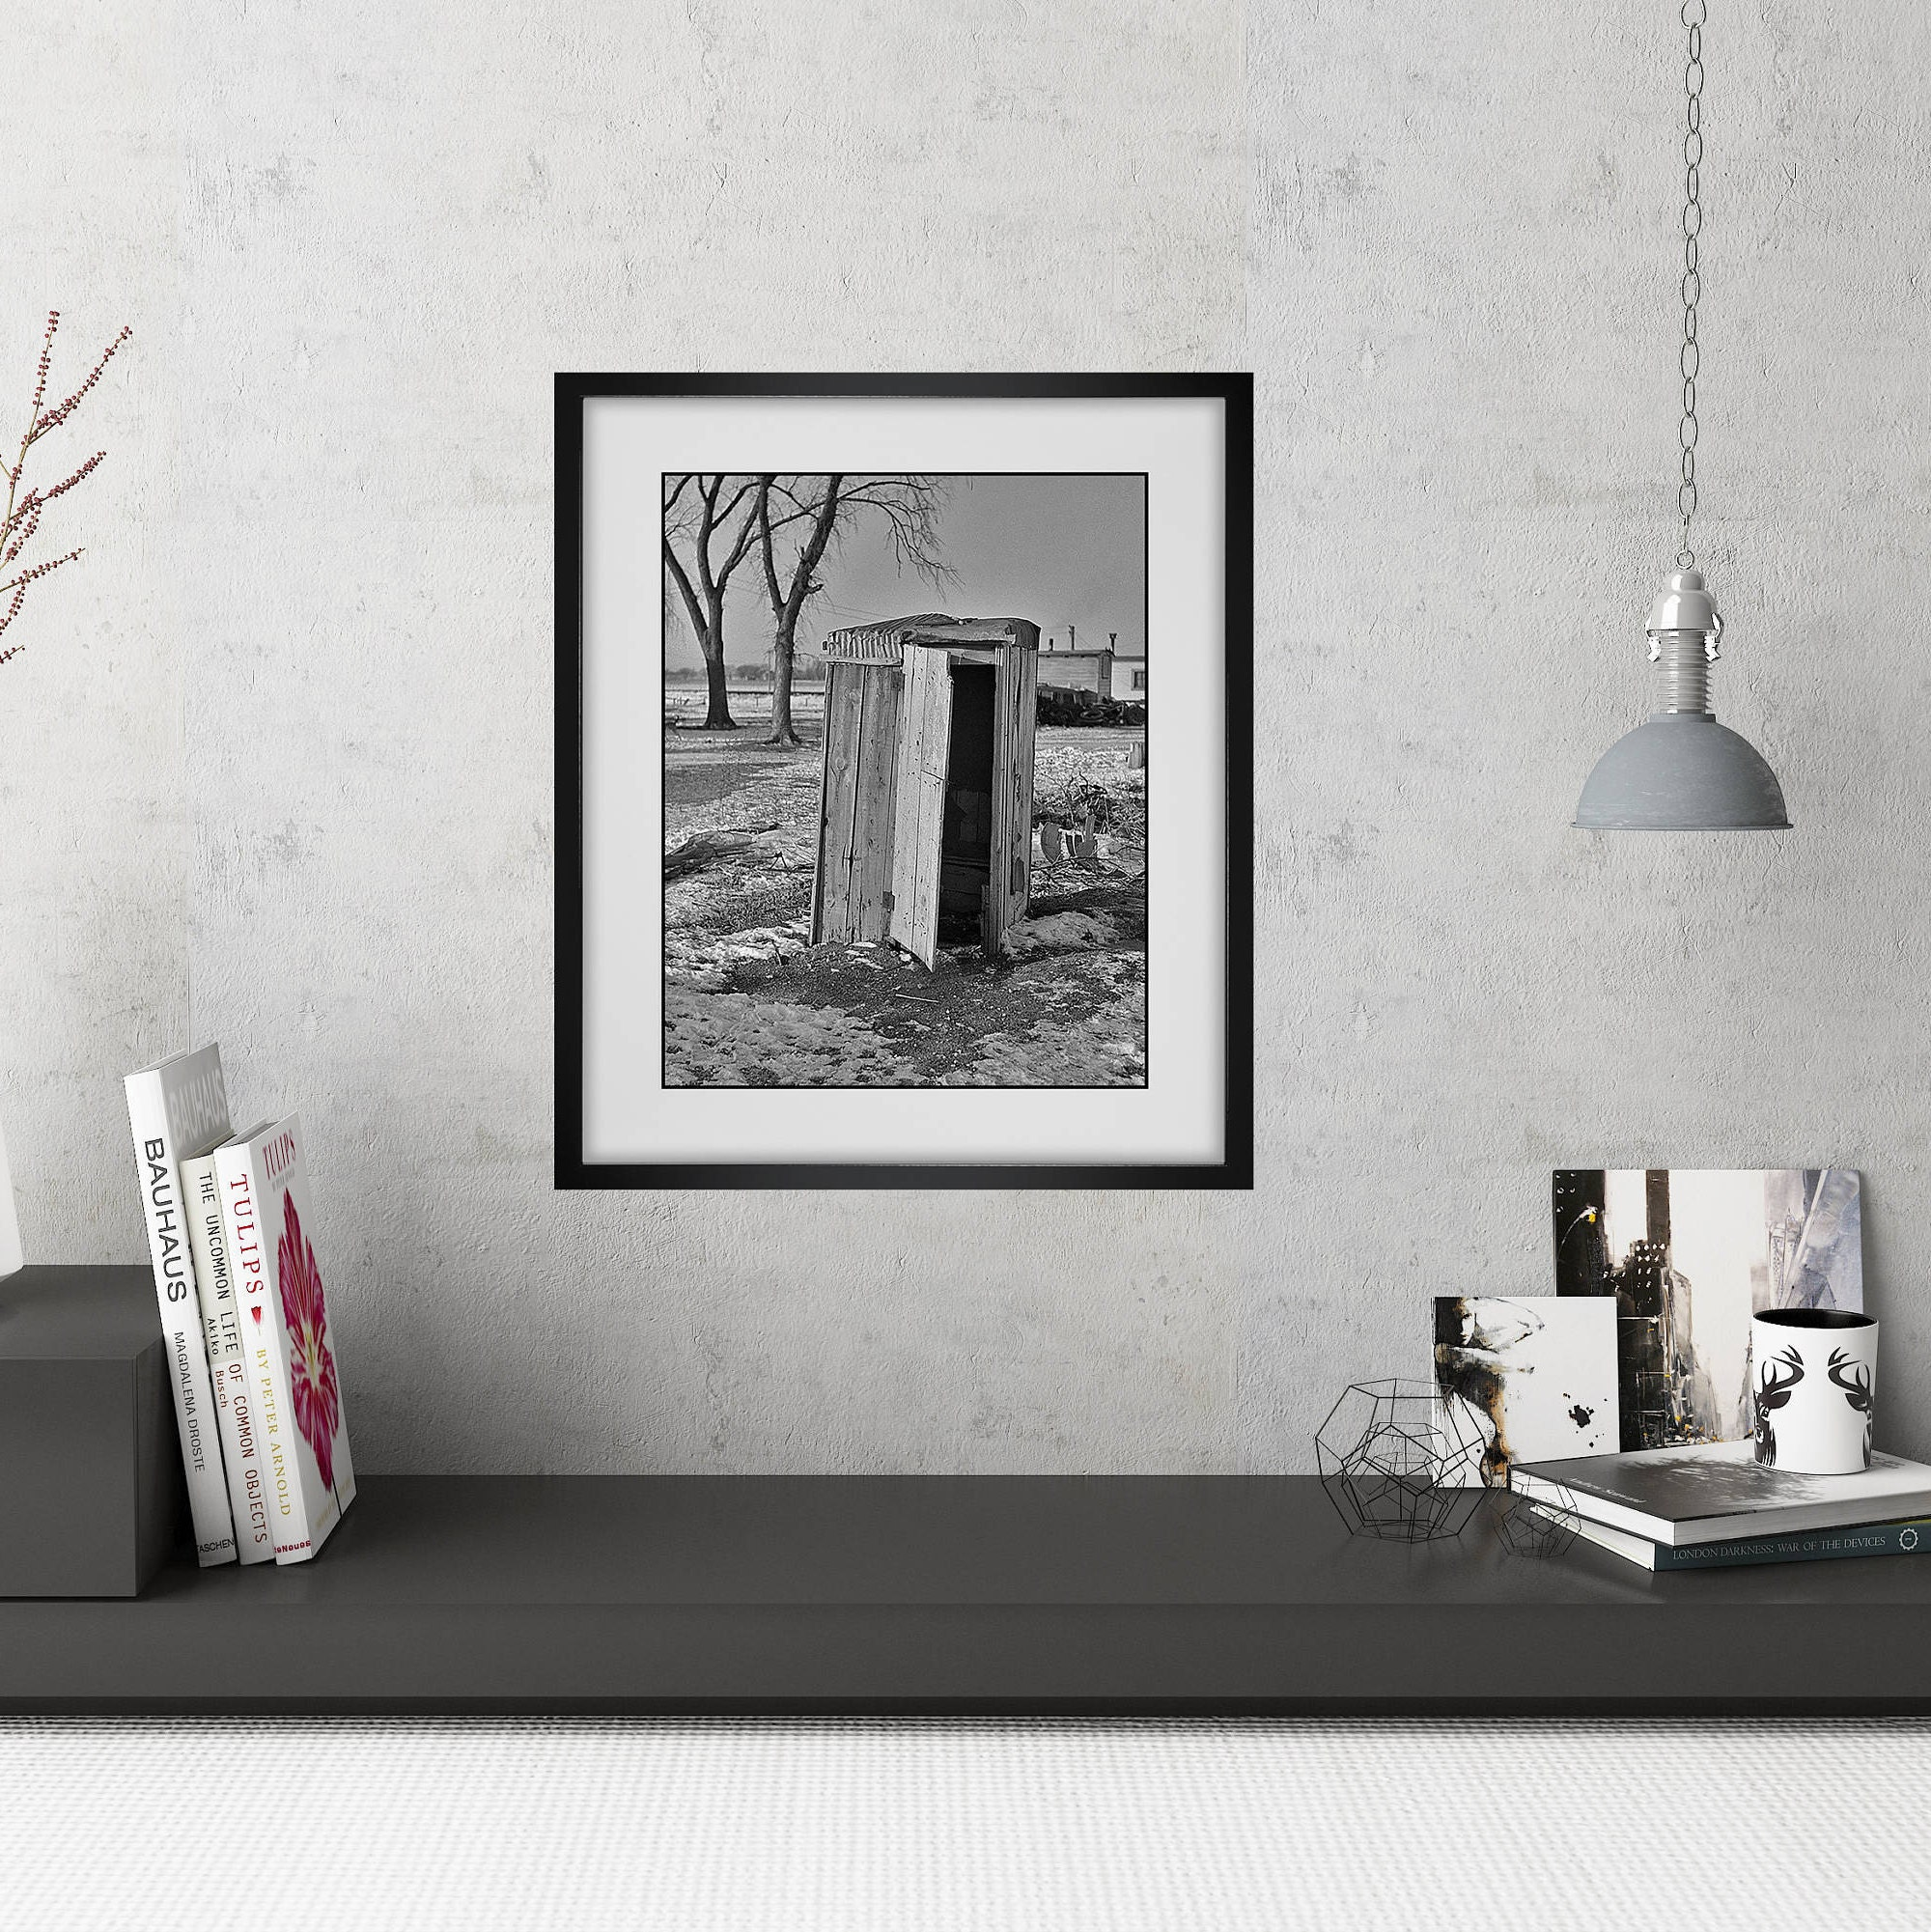 Modern Farmhouse Wall Art / Funny Bathroom Art / Framed Powder Room Prints  / Vintage Black And White Outhouse Photo / Framed Wall Art